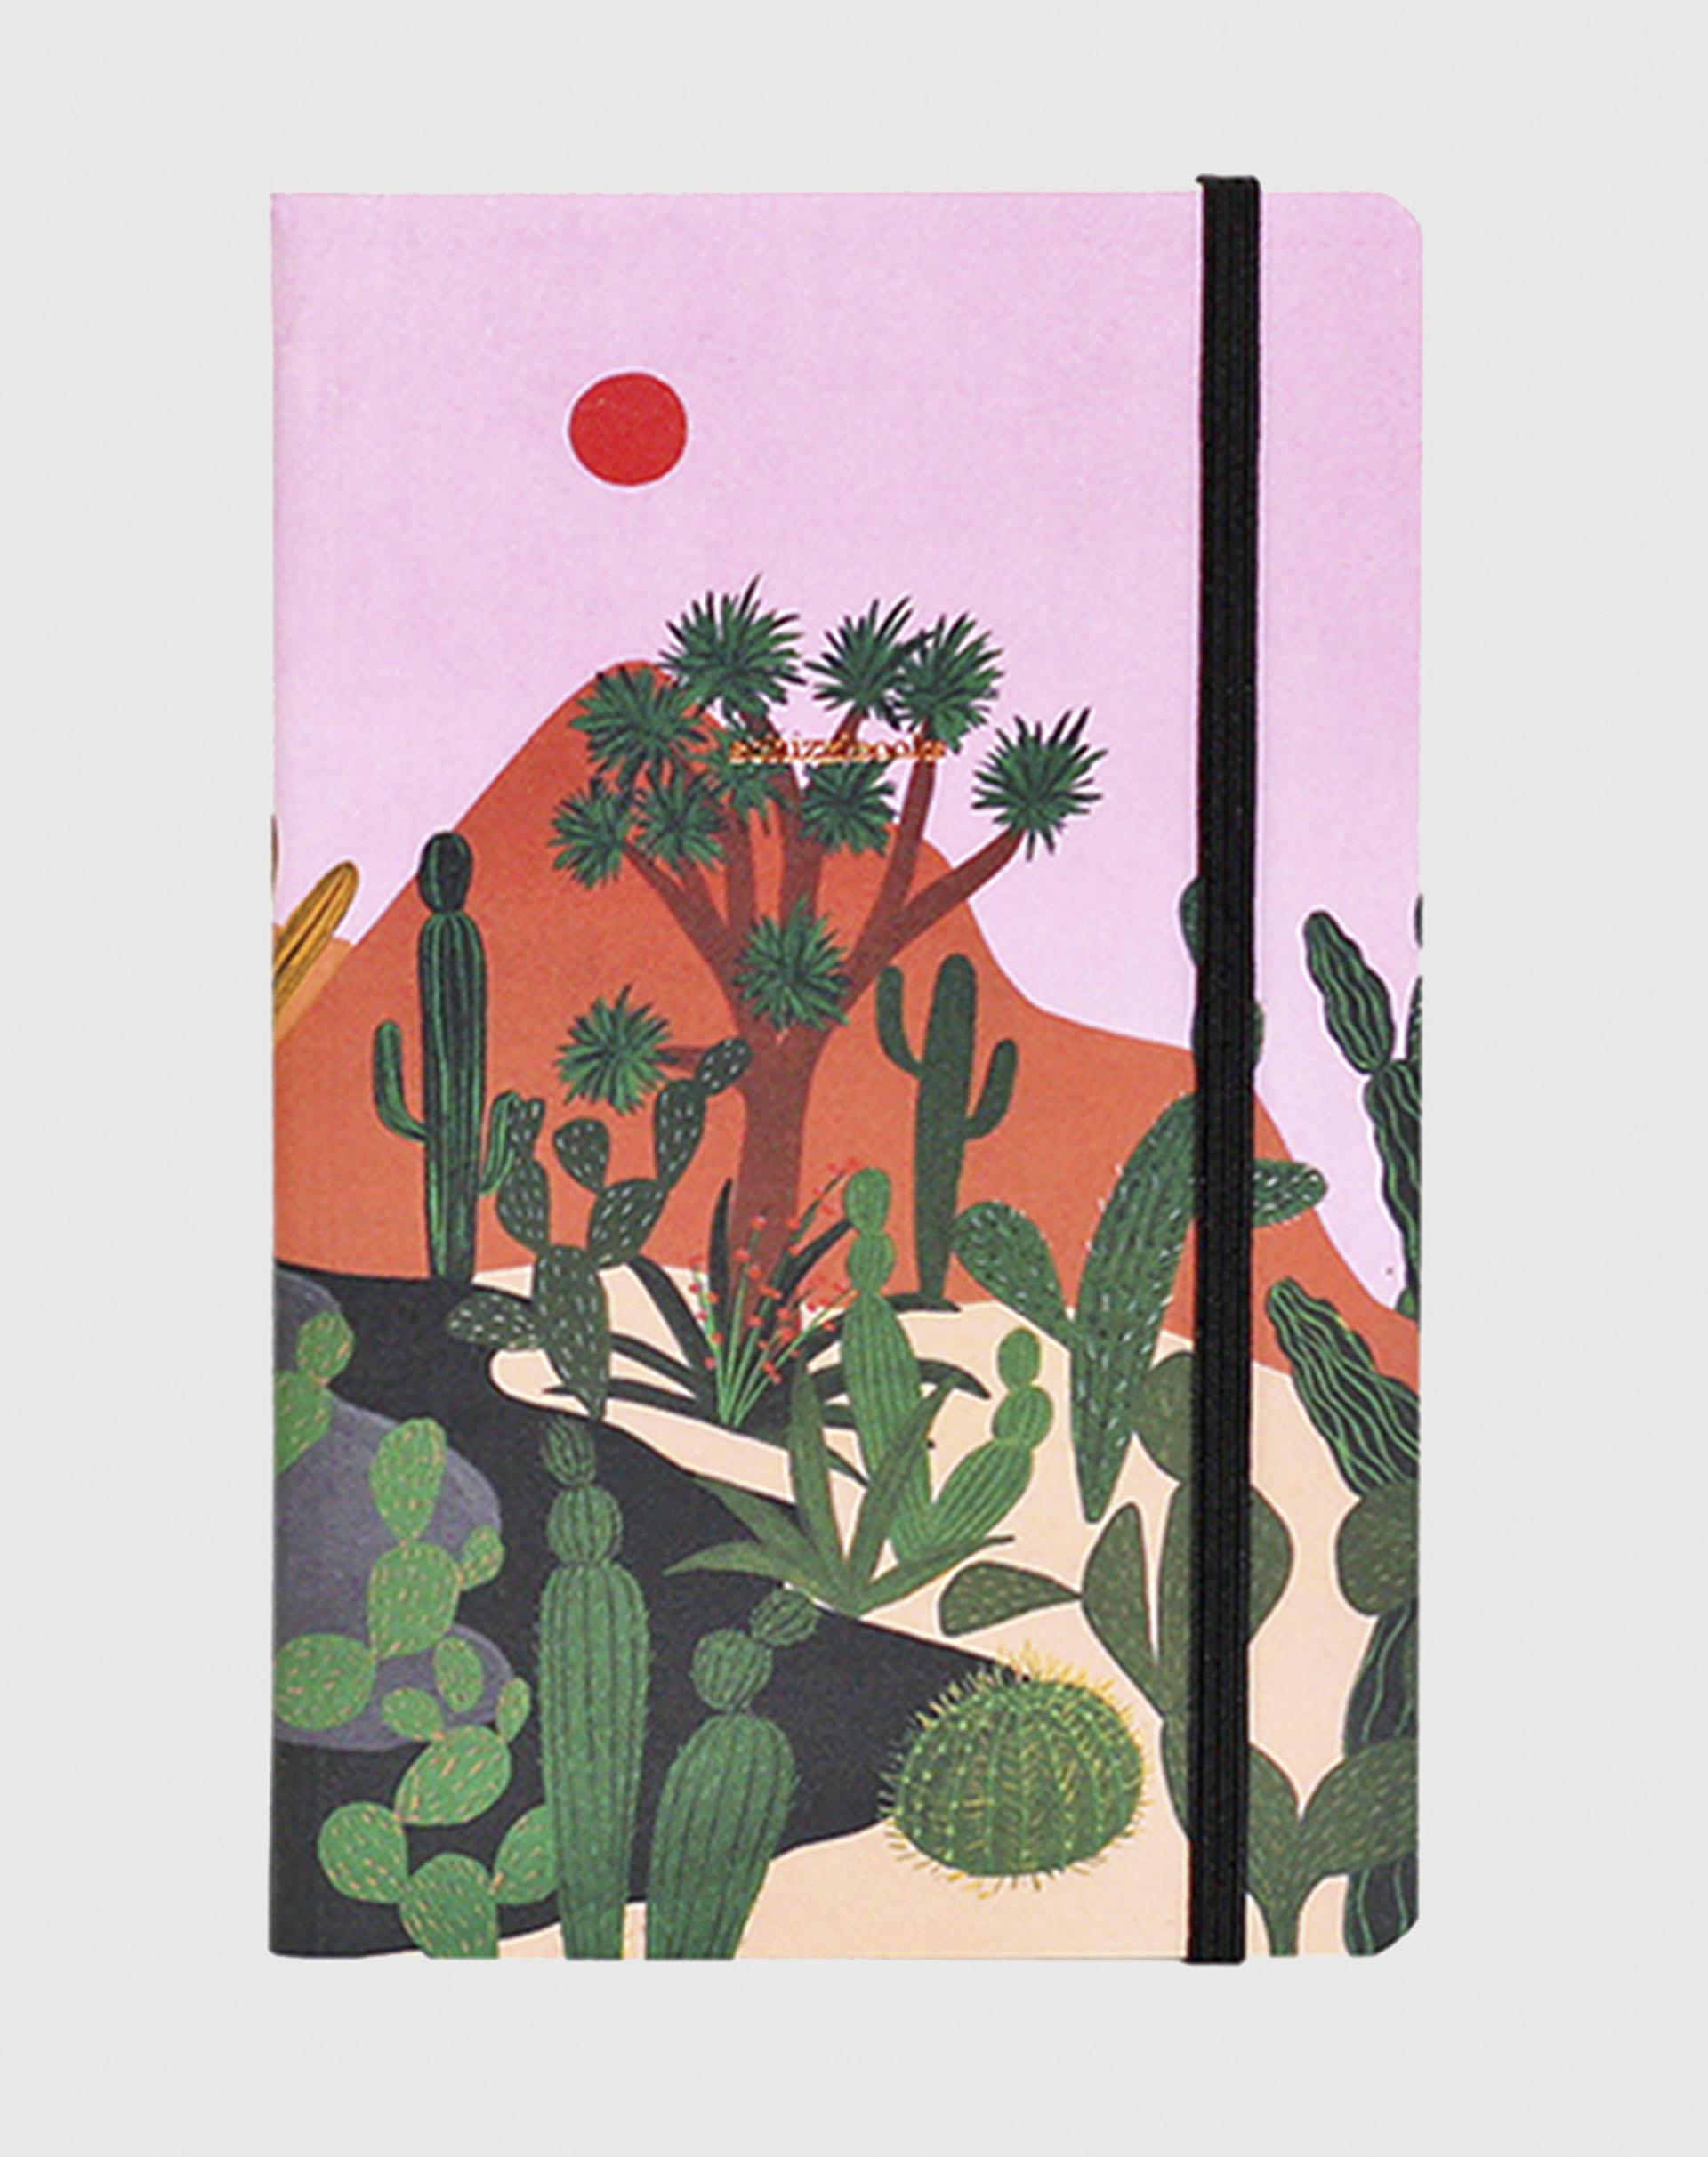 AMARO Feminino SCHIZZIBOOKS SKETCHBOOK LARGE, JOSHUA